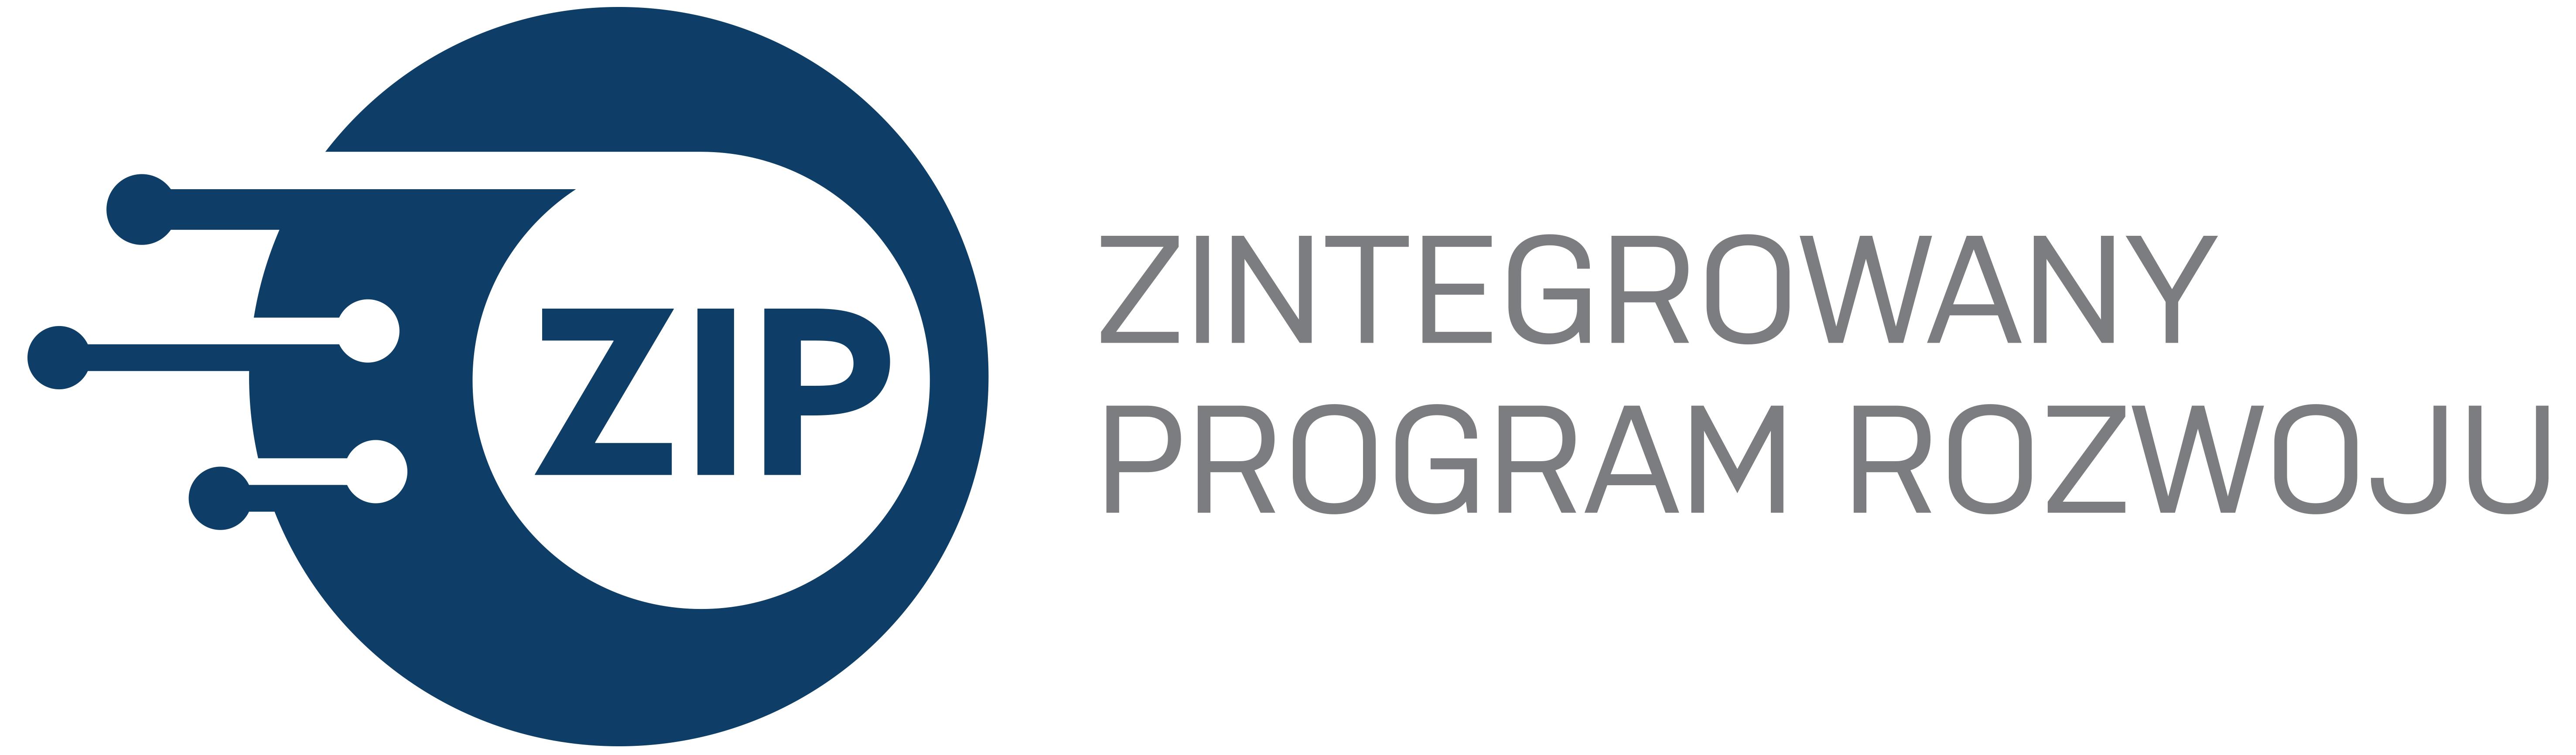 Logotyp programu ZIP